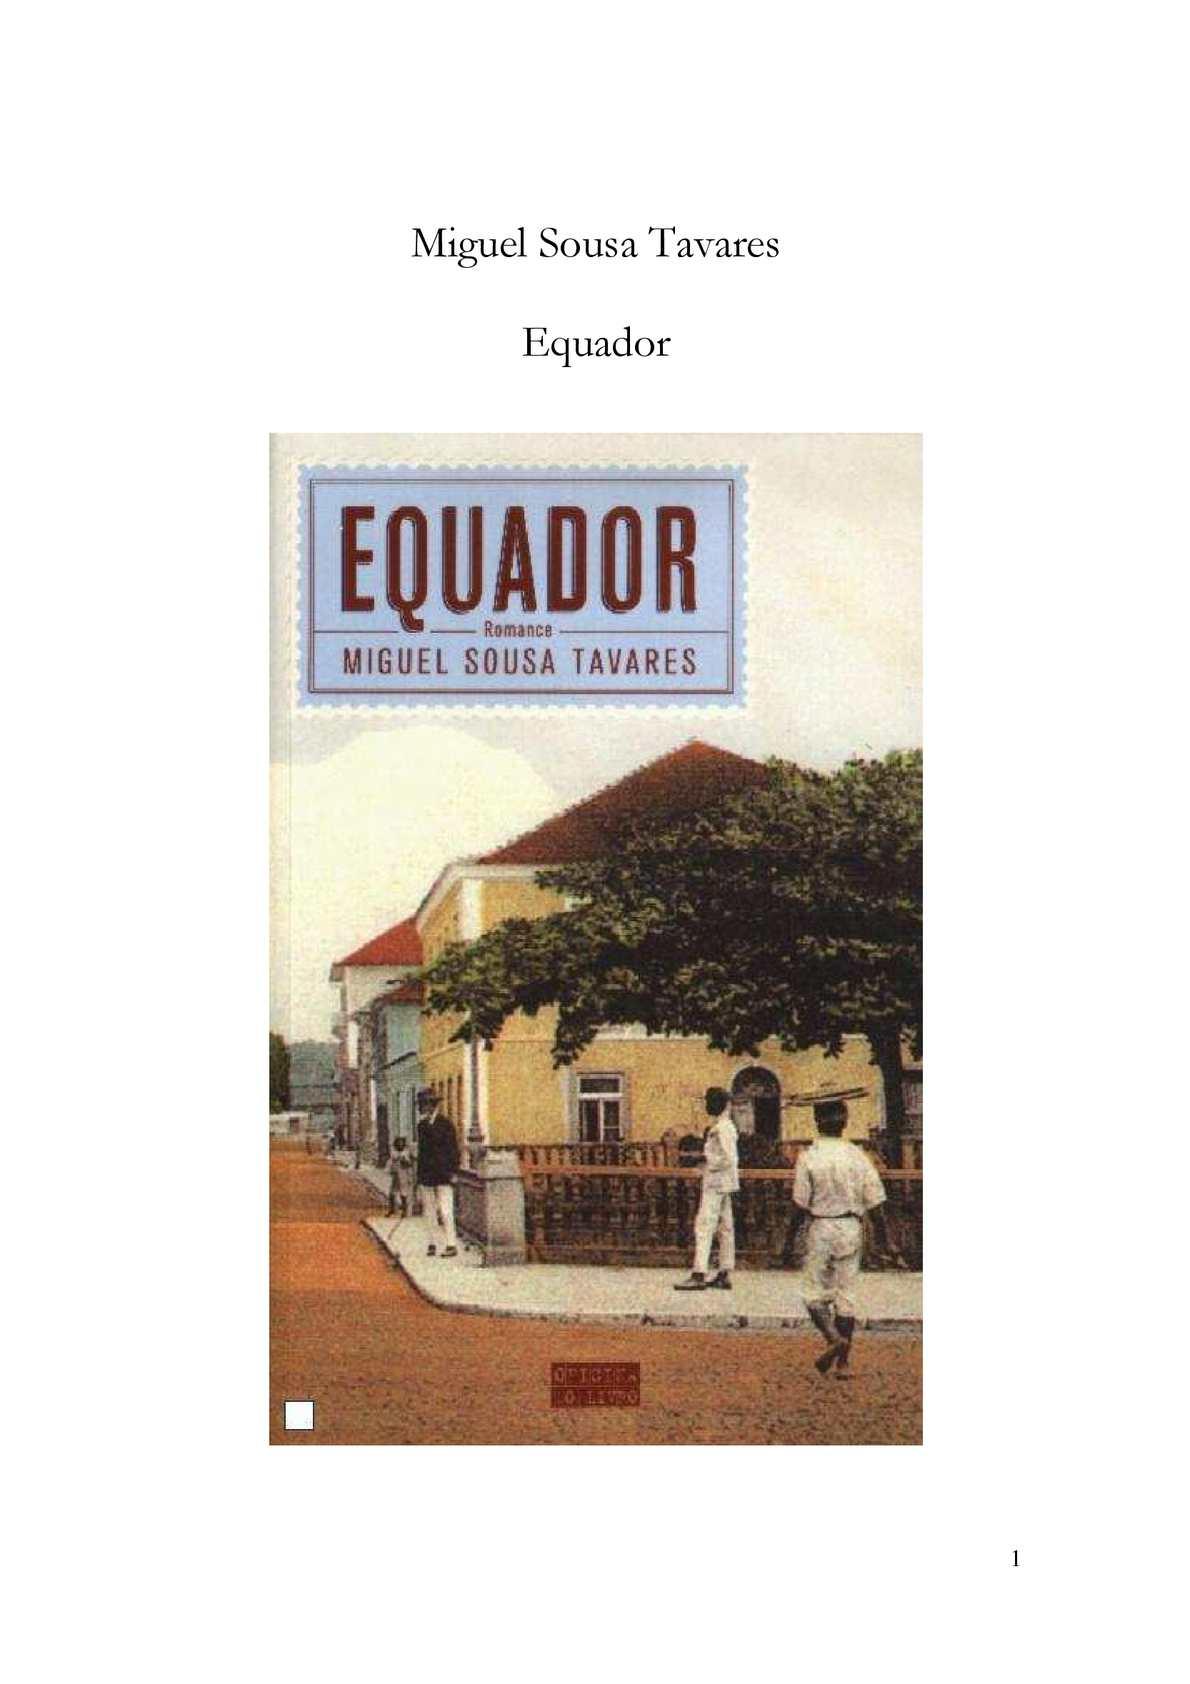 Calaméo - Miguel Sousa Tavares - Equador 23a6e684ba